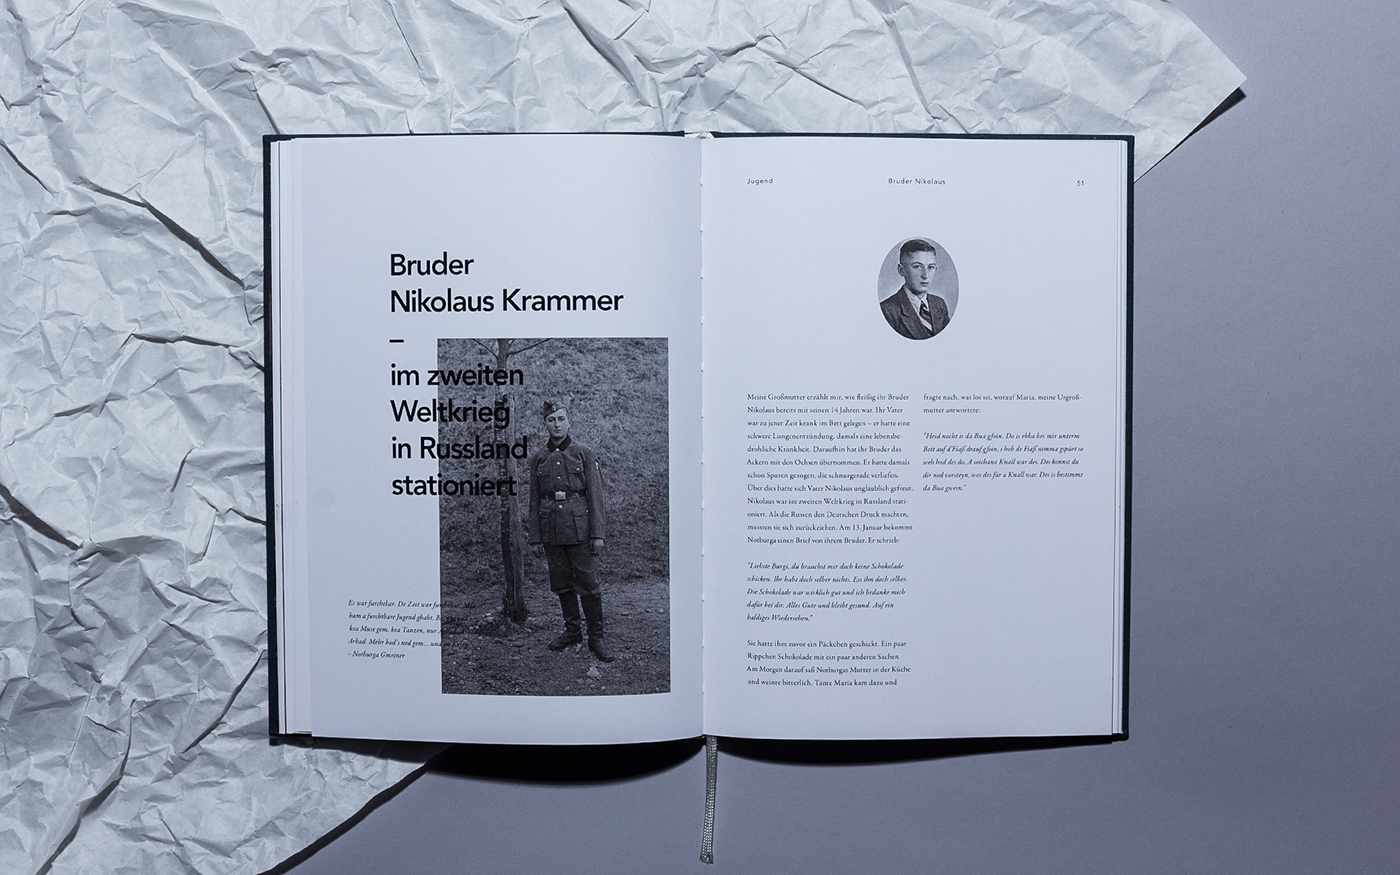 Notburga Gmeiner Lukas MANUEL altmann book Ancestors grandmother fakultät würzburg gestaltung FHWS